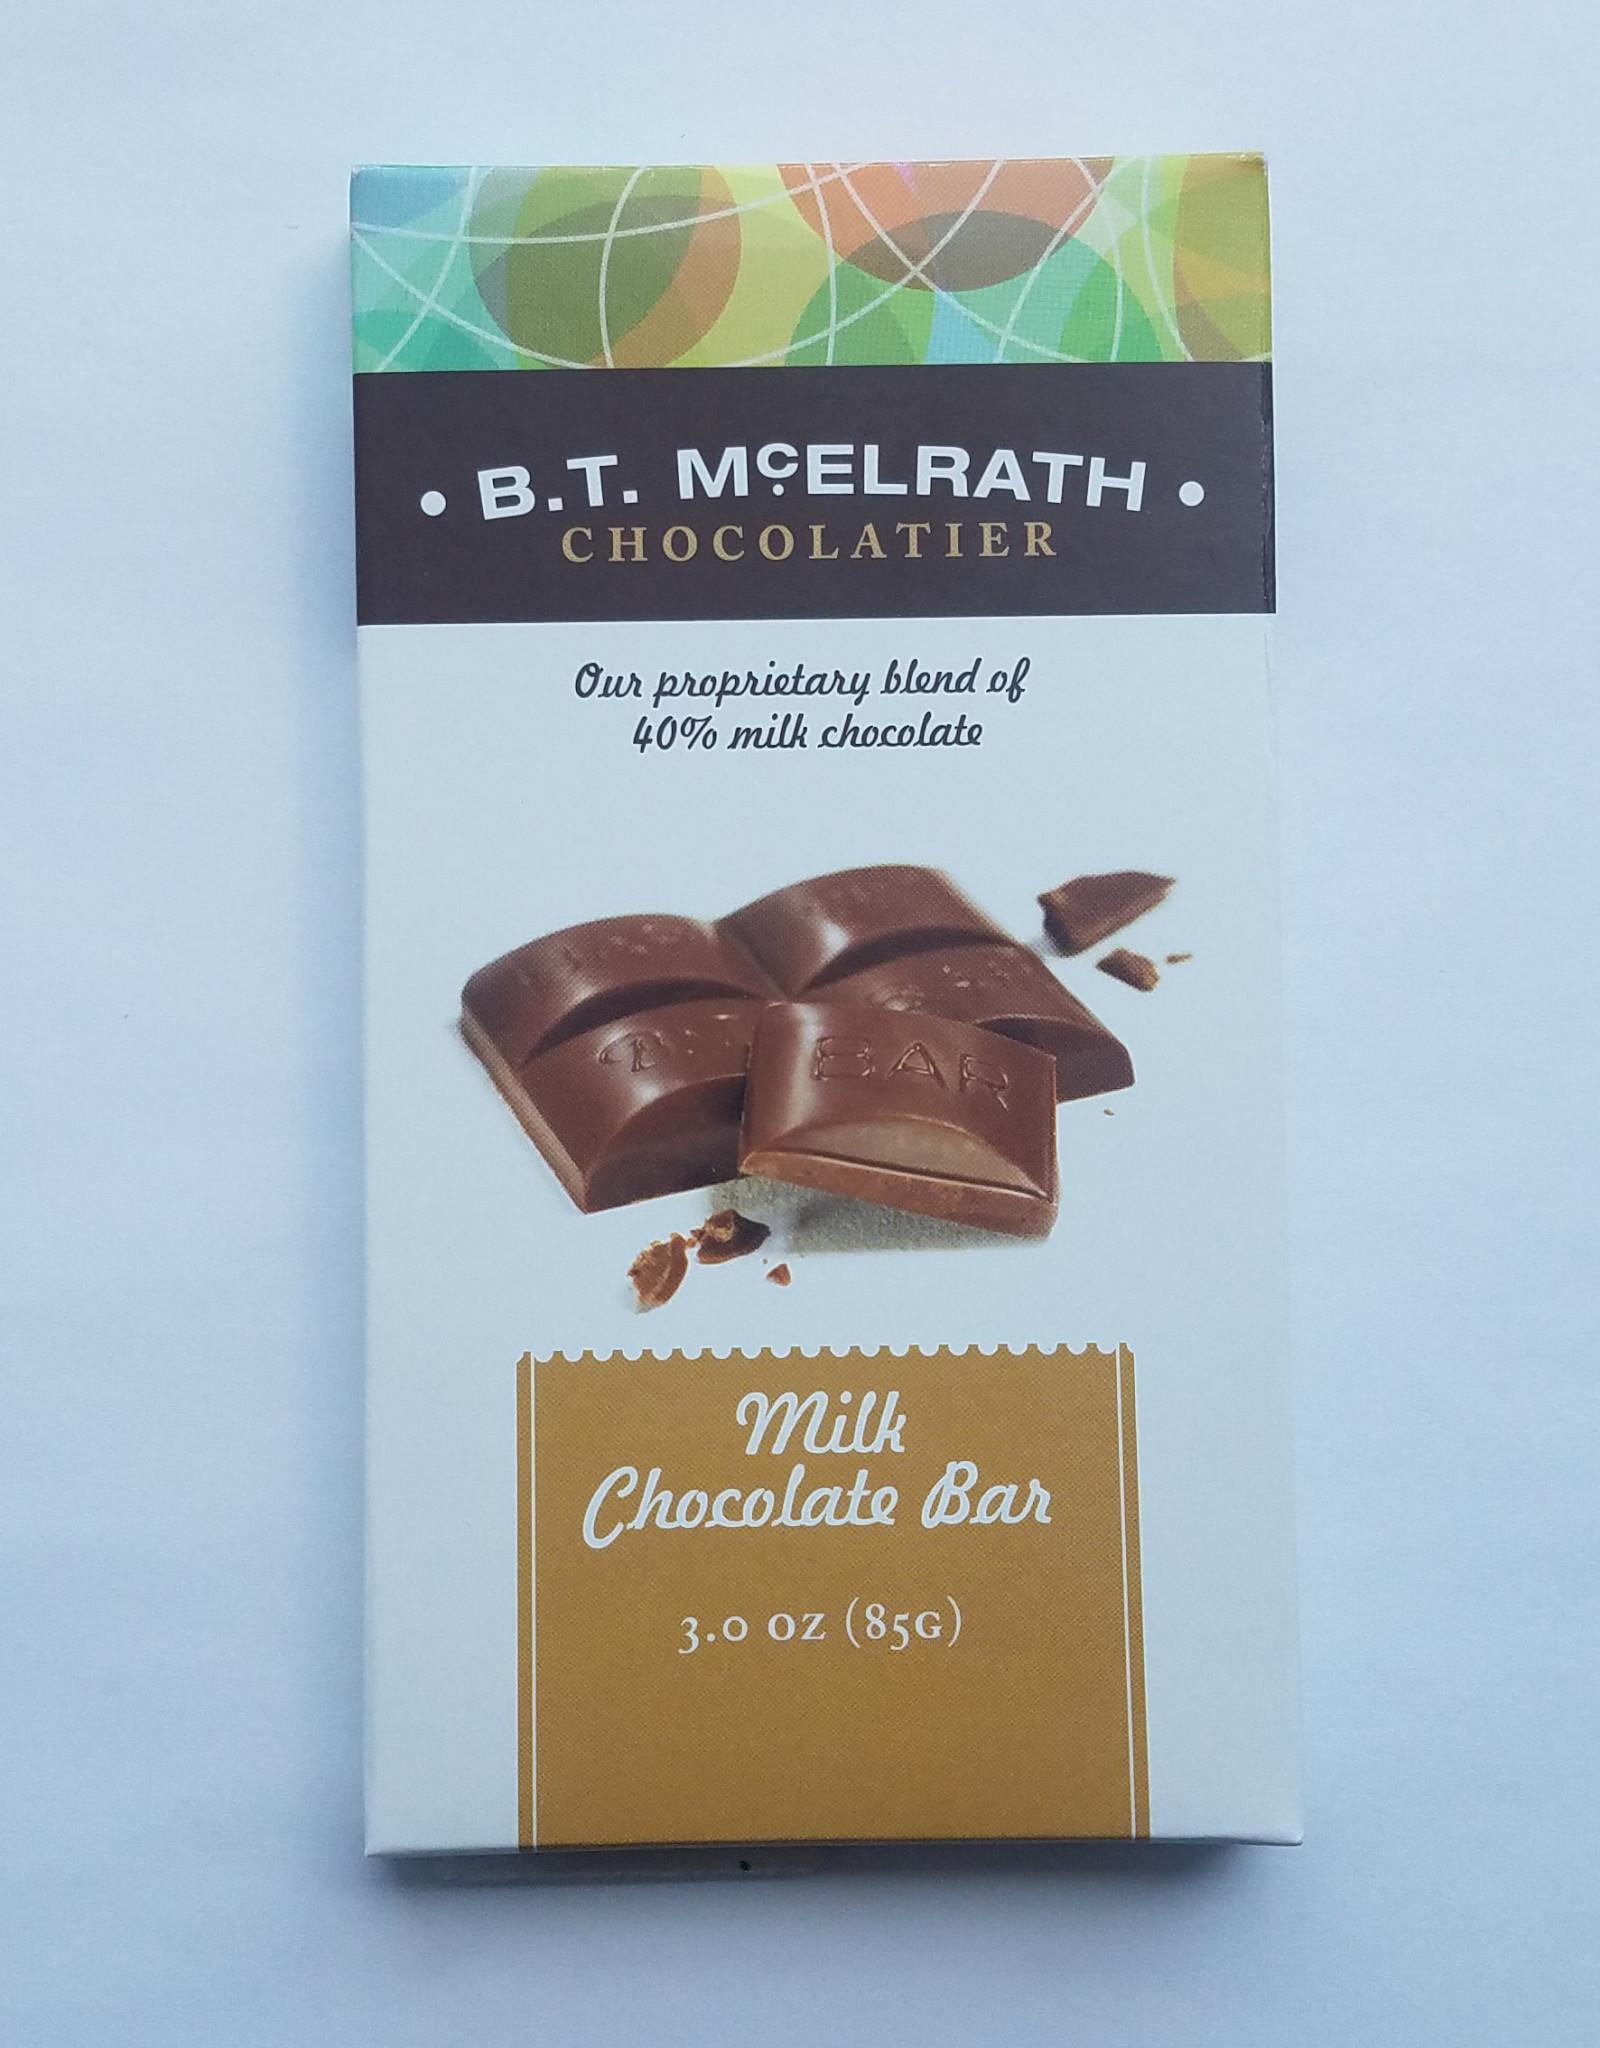 BT McElrath 40% Milk Choc Bar, 3 oz